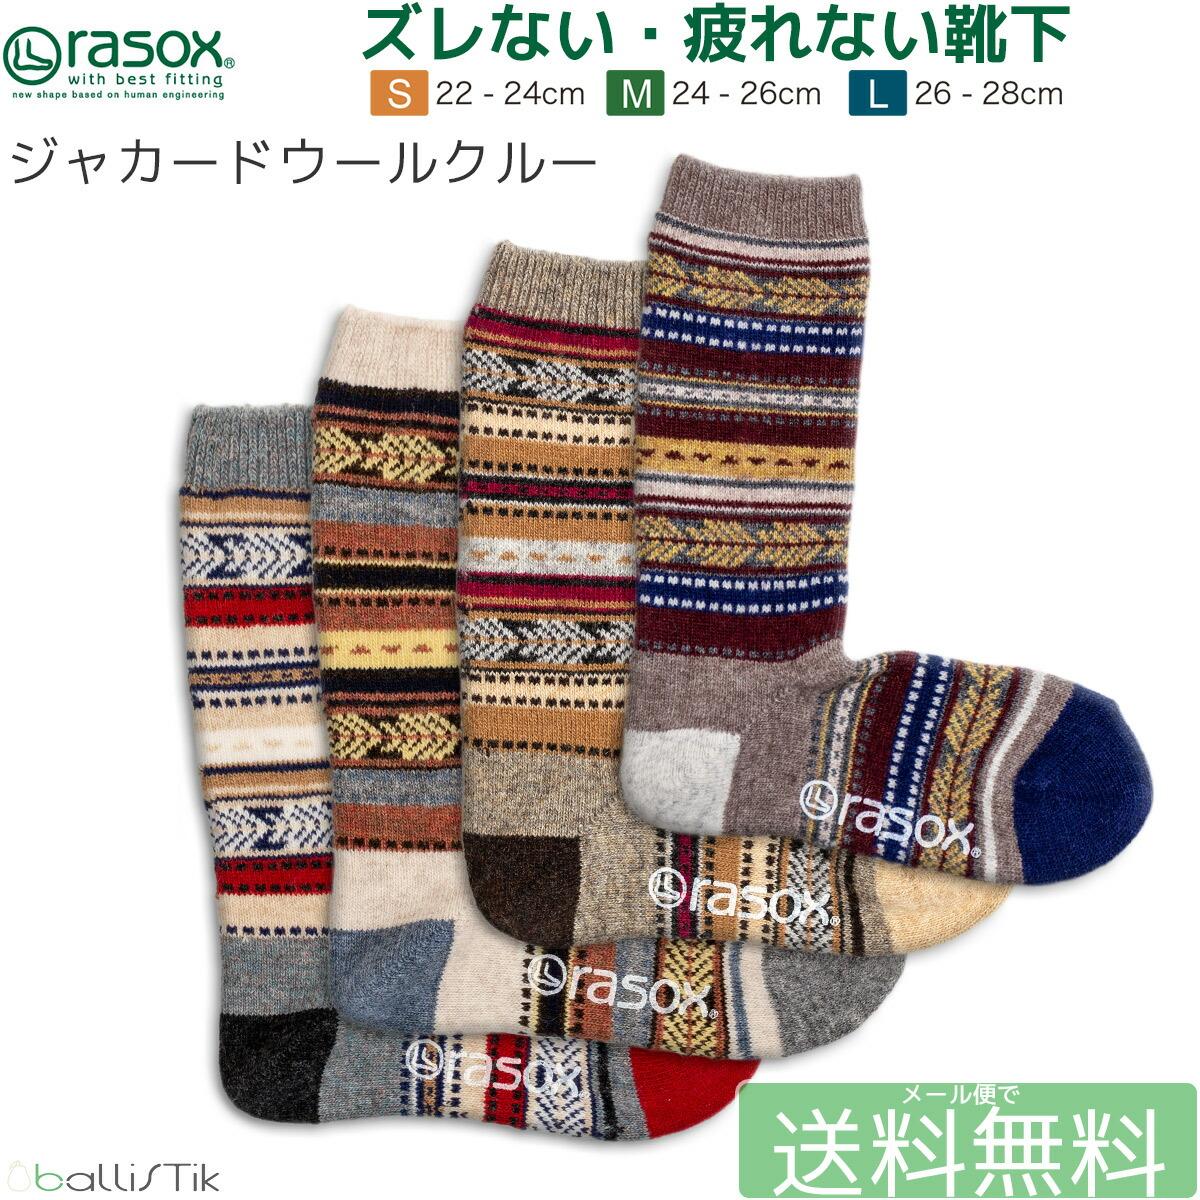 rasox/�饽�å���/����/���롼���å���/�����륽�å���/����/���㥬���ɥ����륯�롼